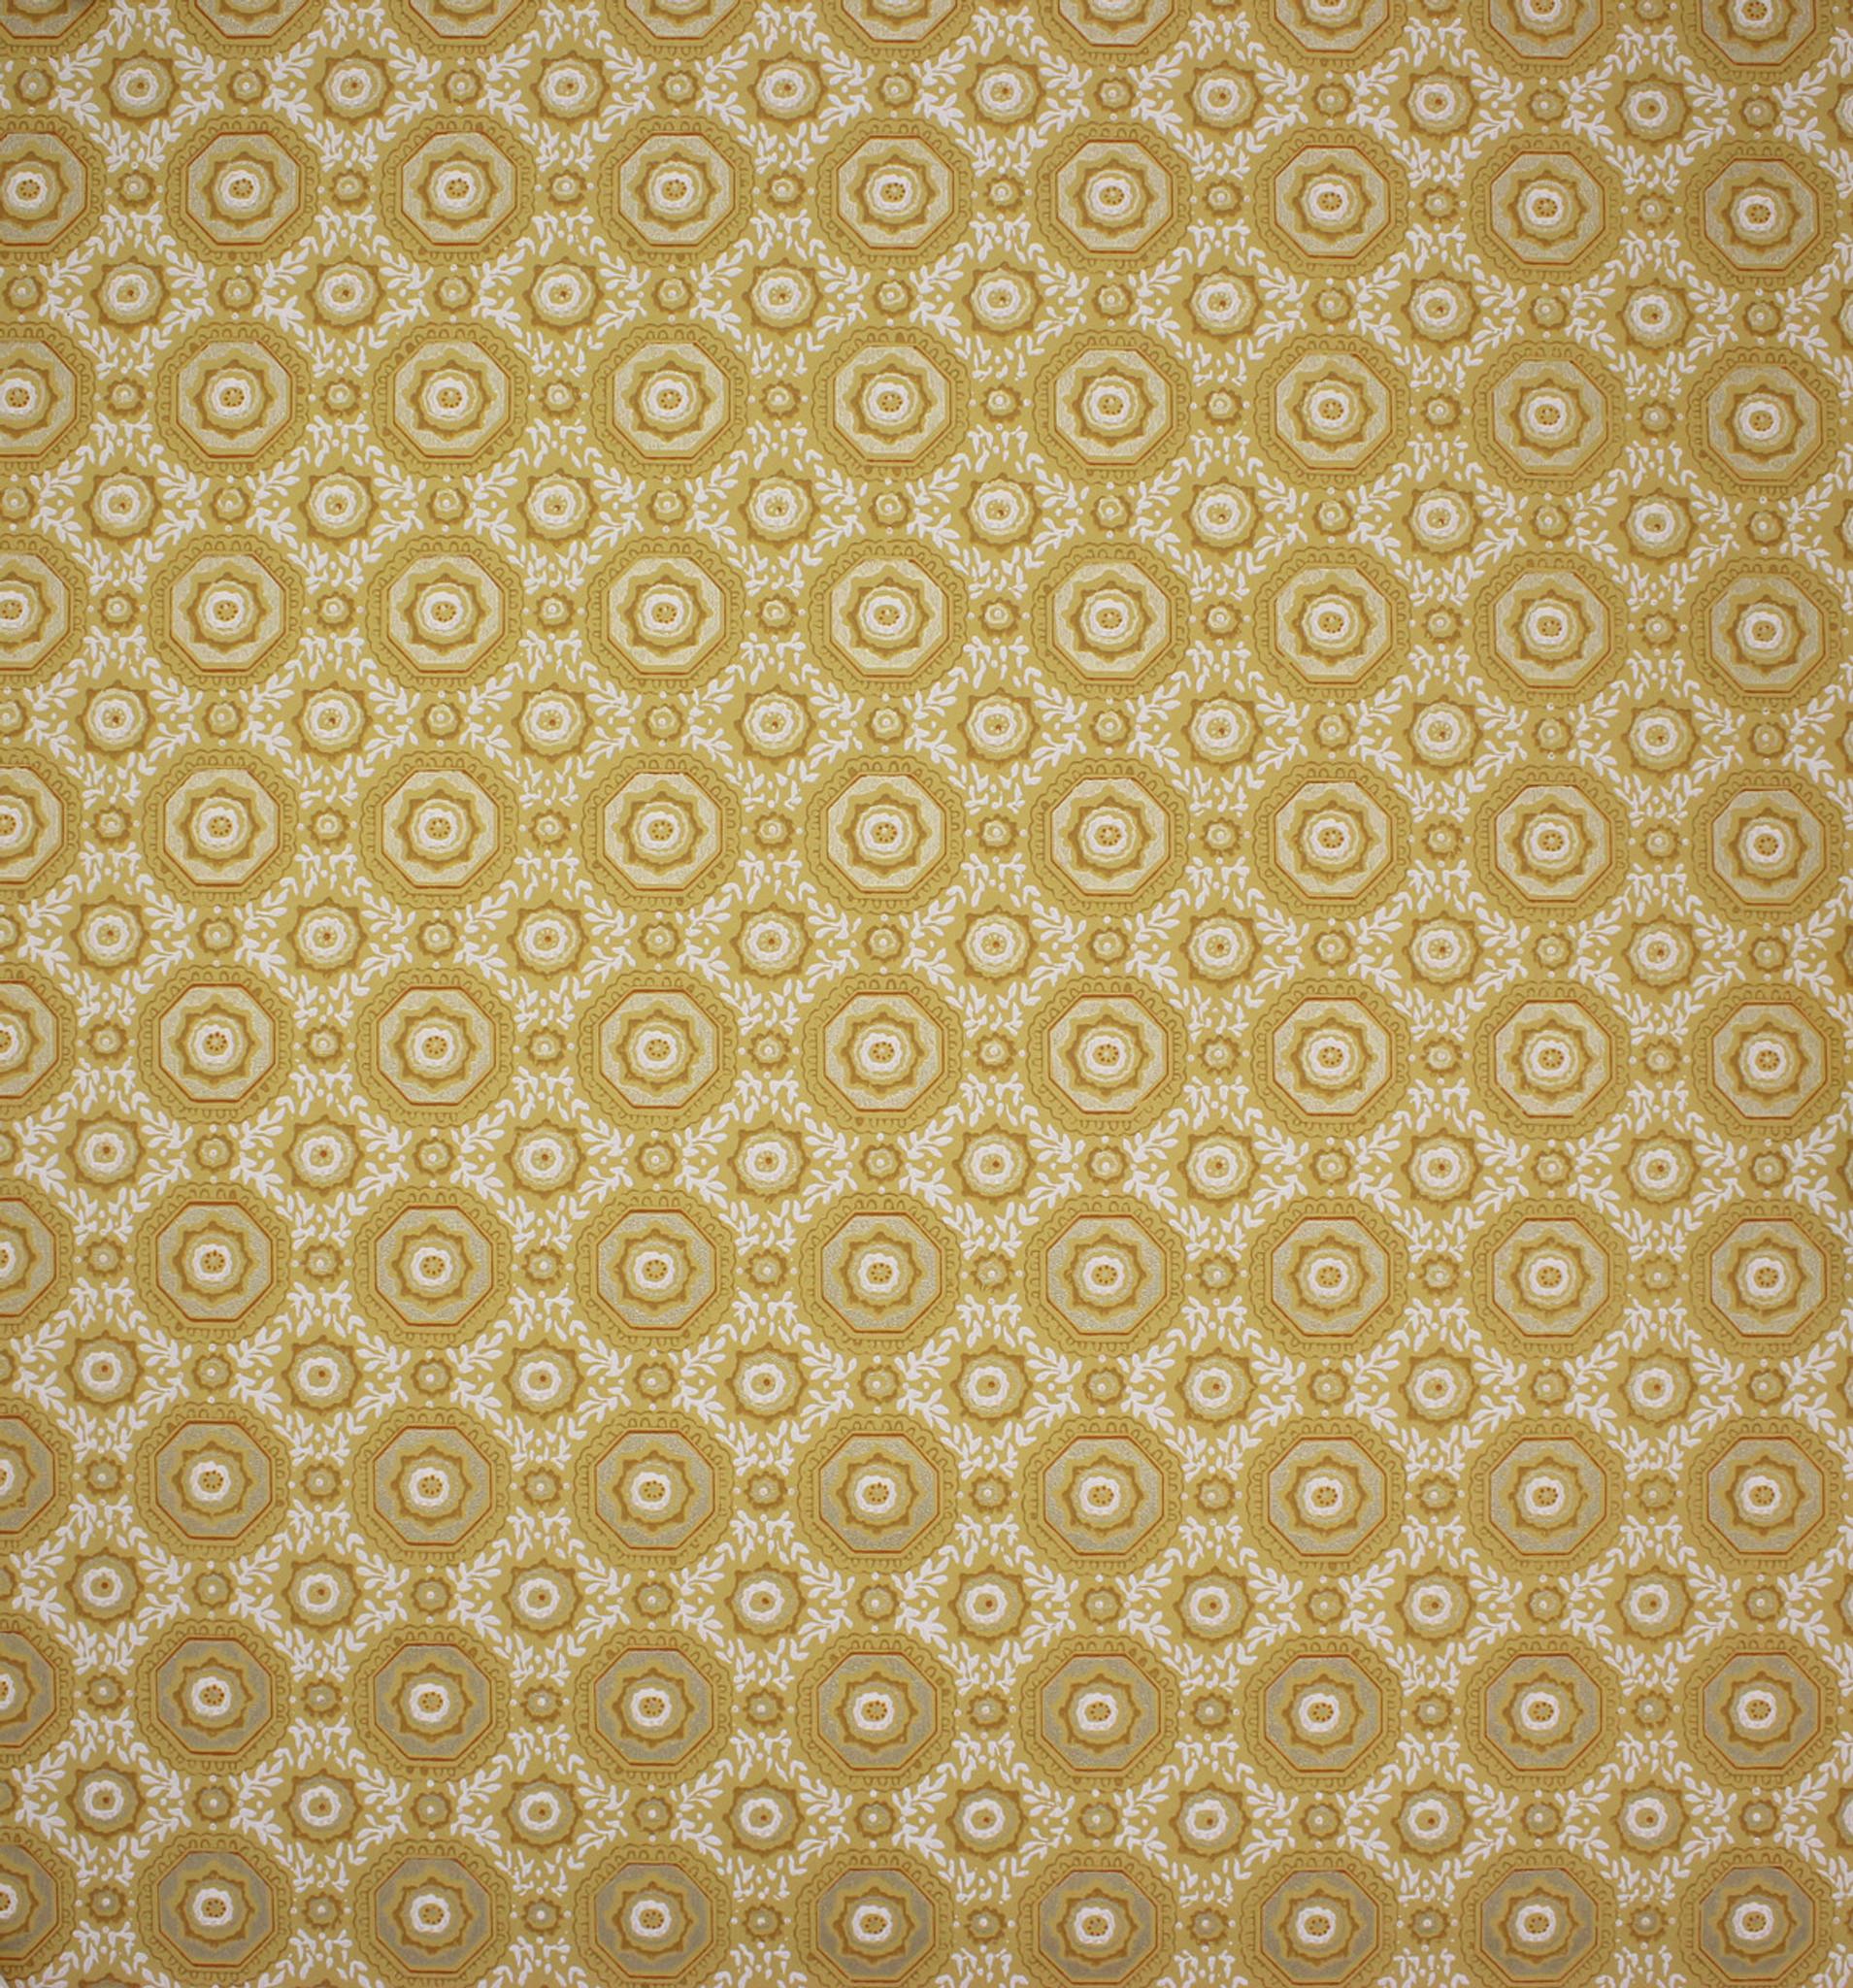 1950s vintage wallpaper white - photo #3